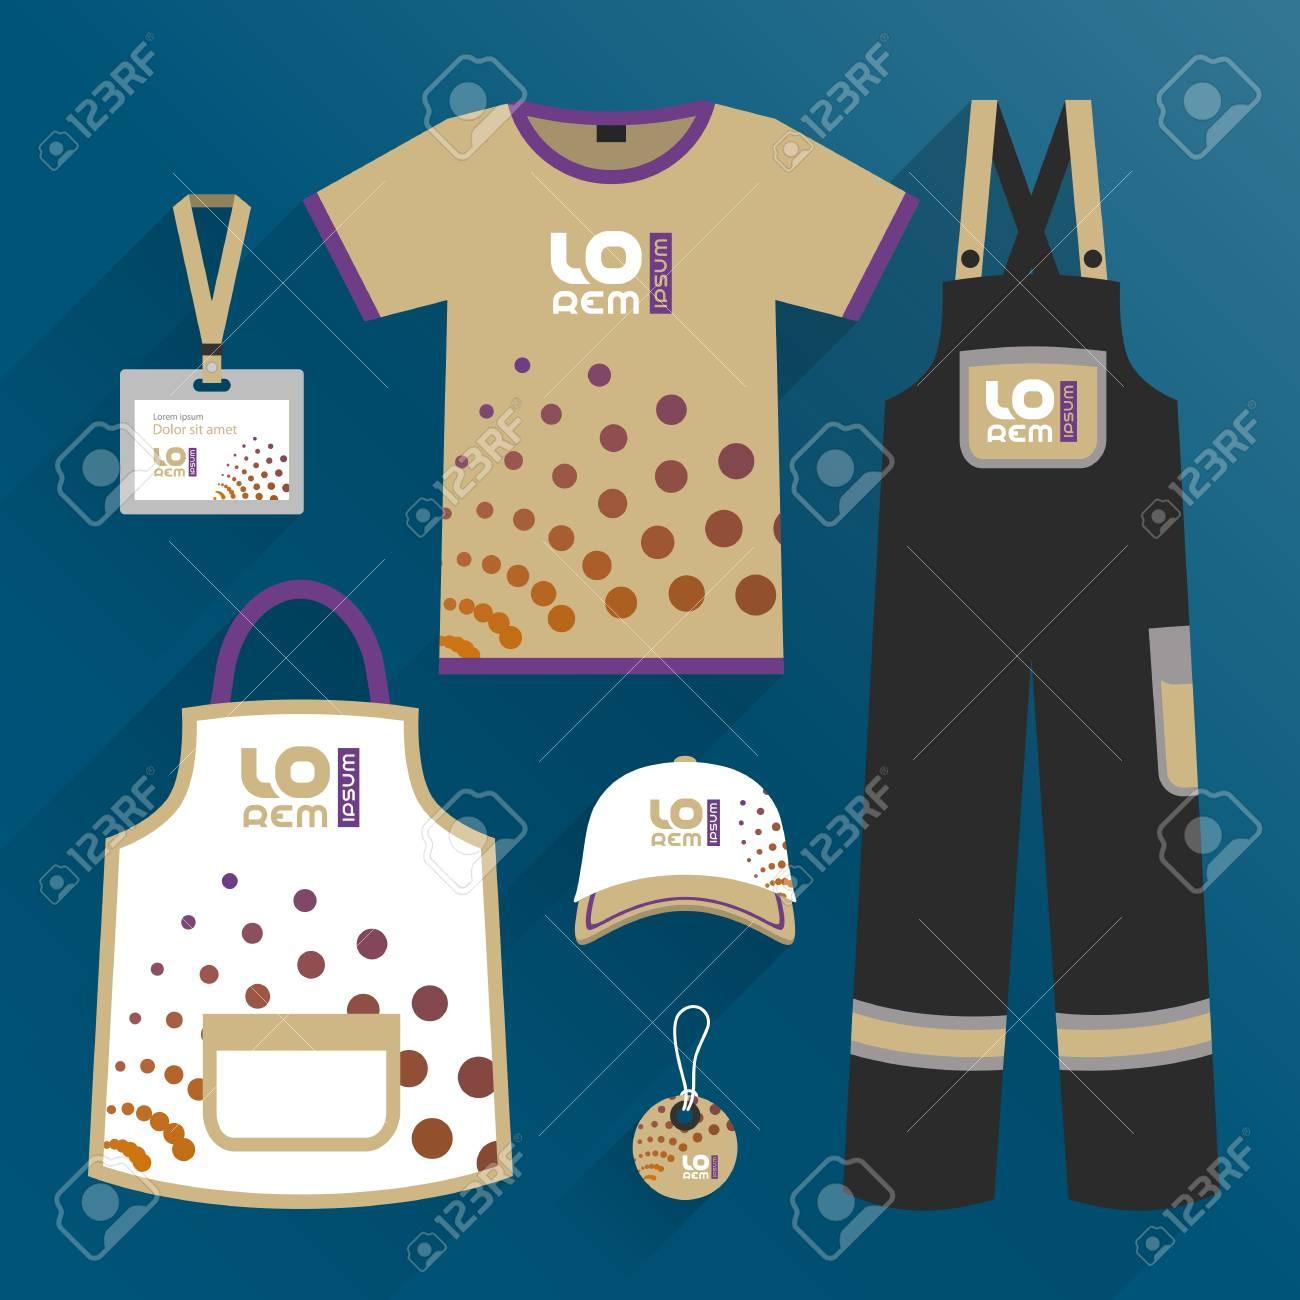 Modern Promotional Wear Design Uniform For Corporate Identity